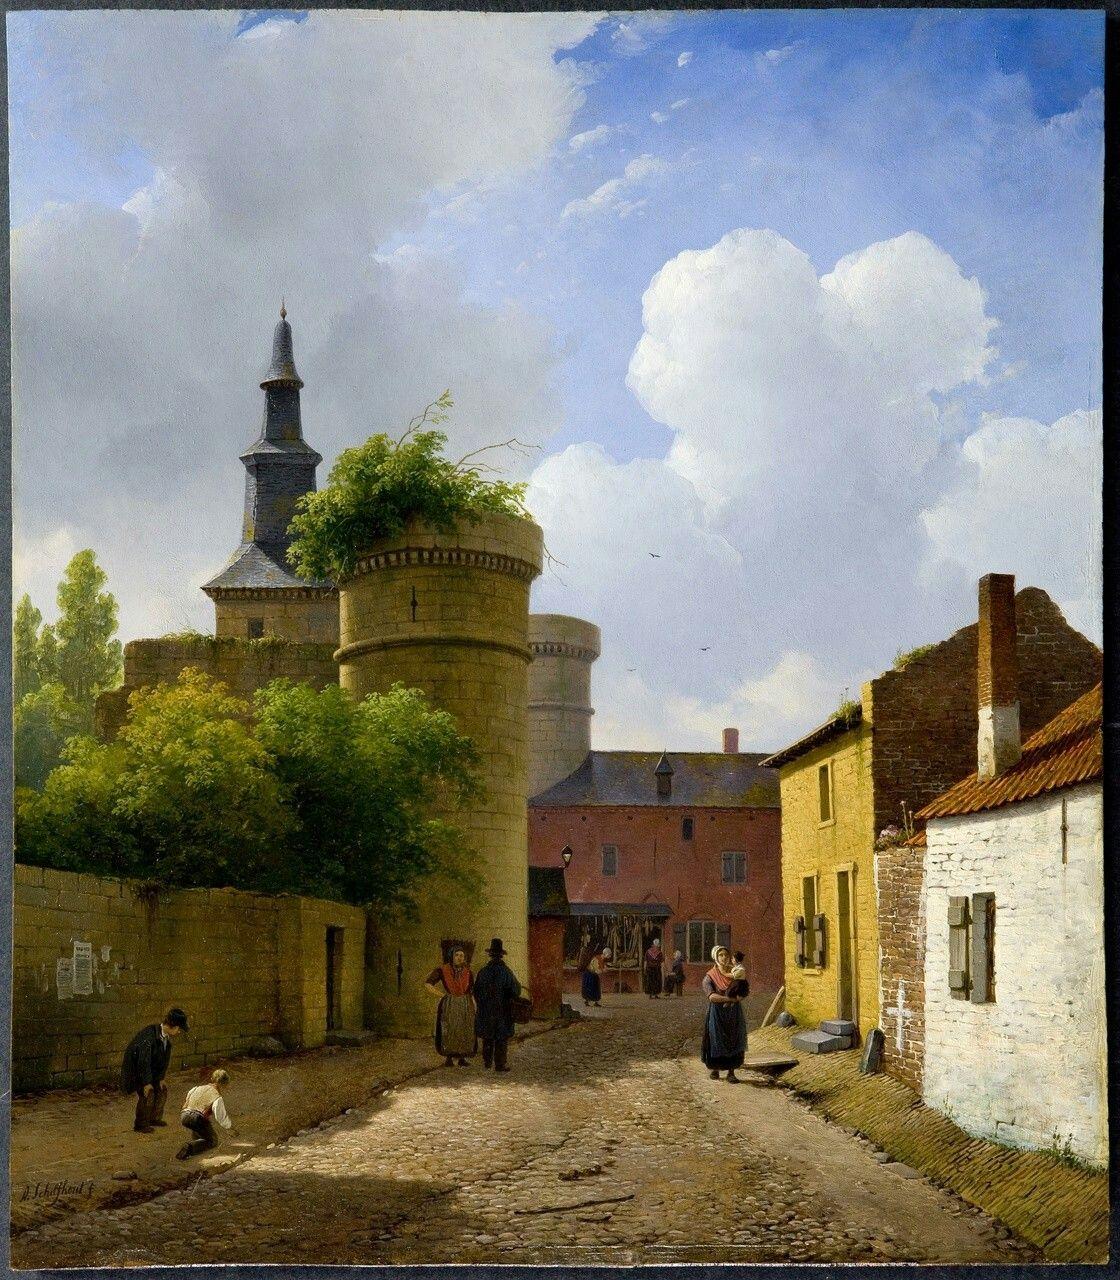 Andreas Schelfhout(1787-1870) - Street in Huy, Belgium c.1825. Oil on panel.